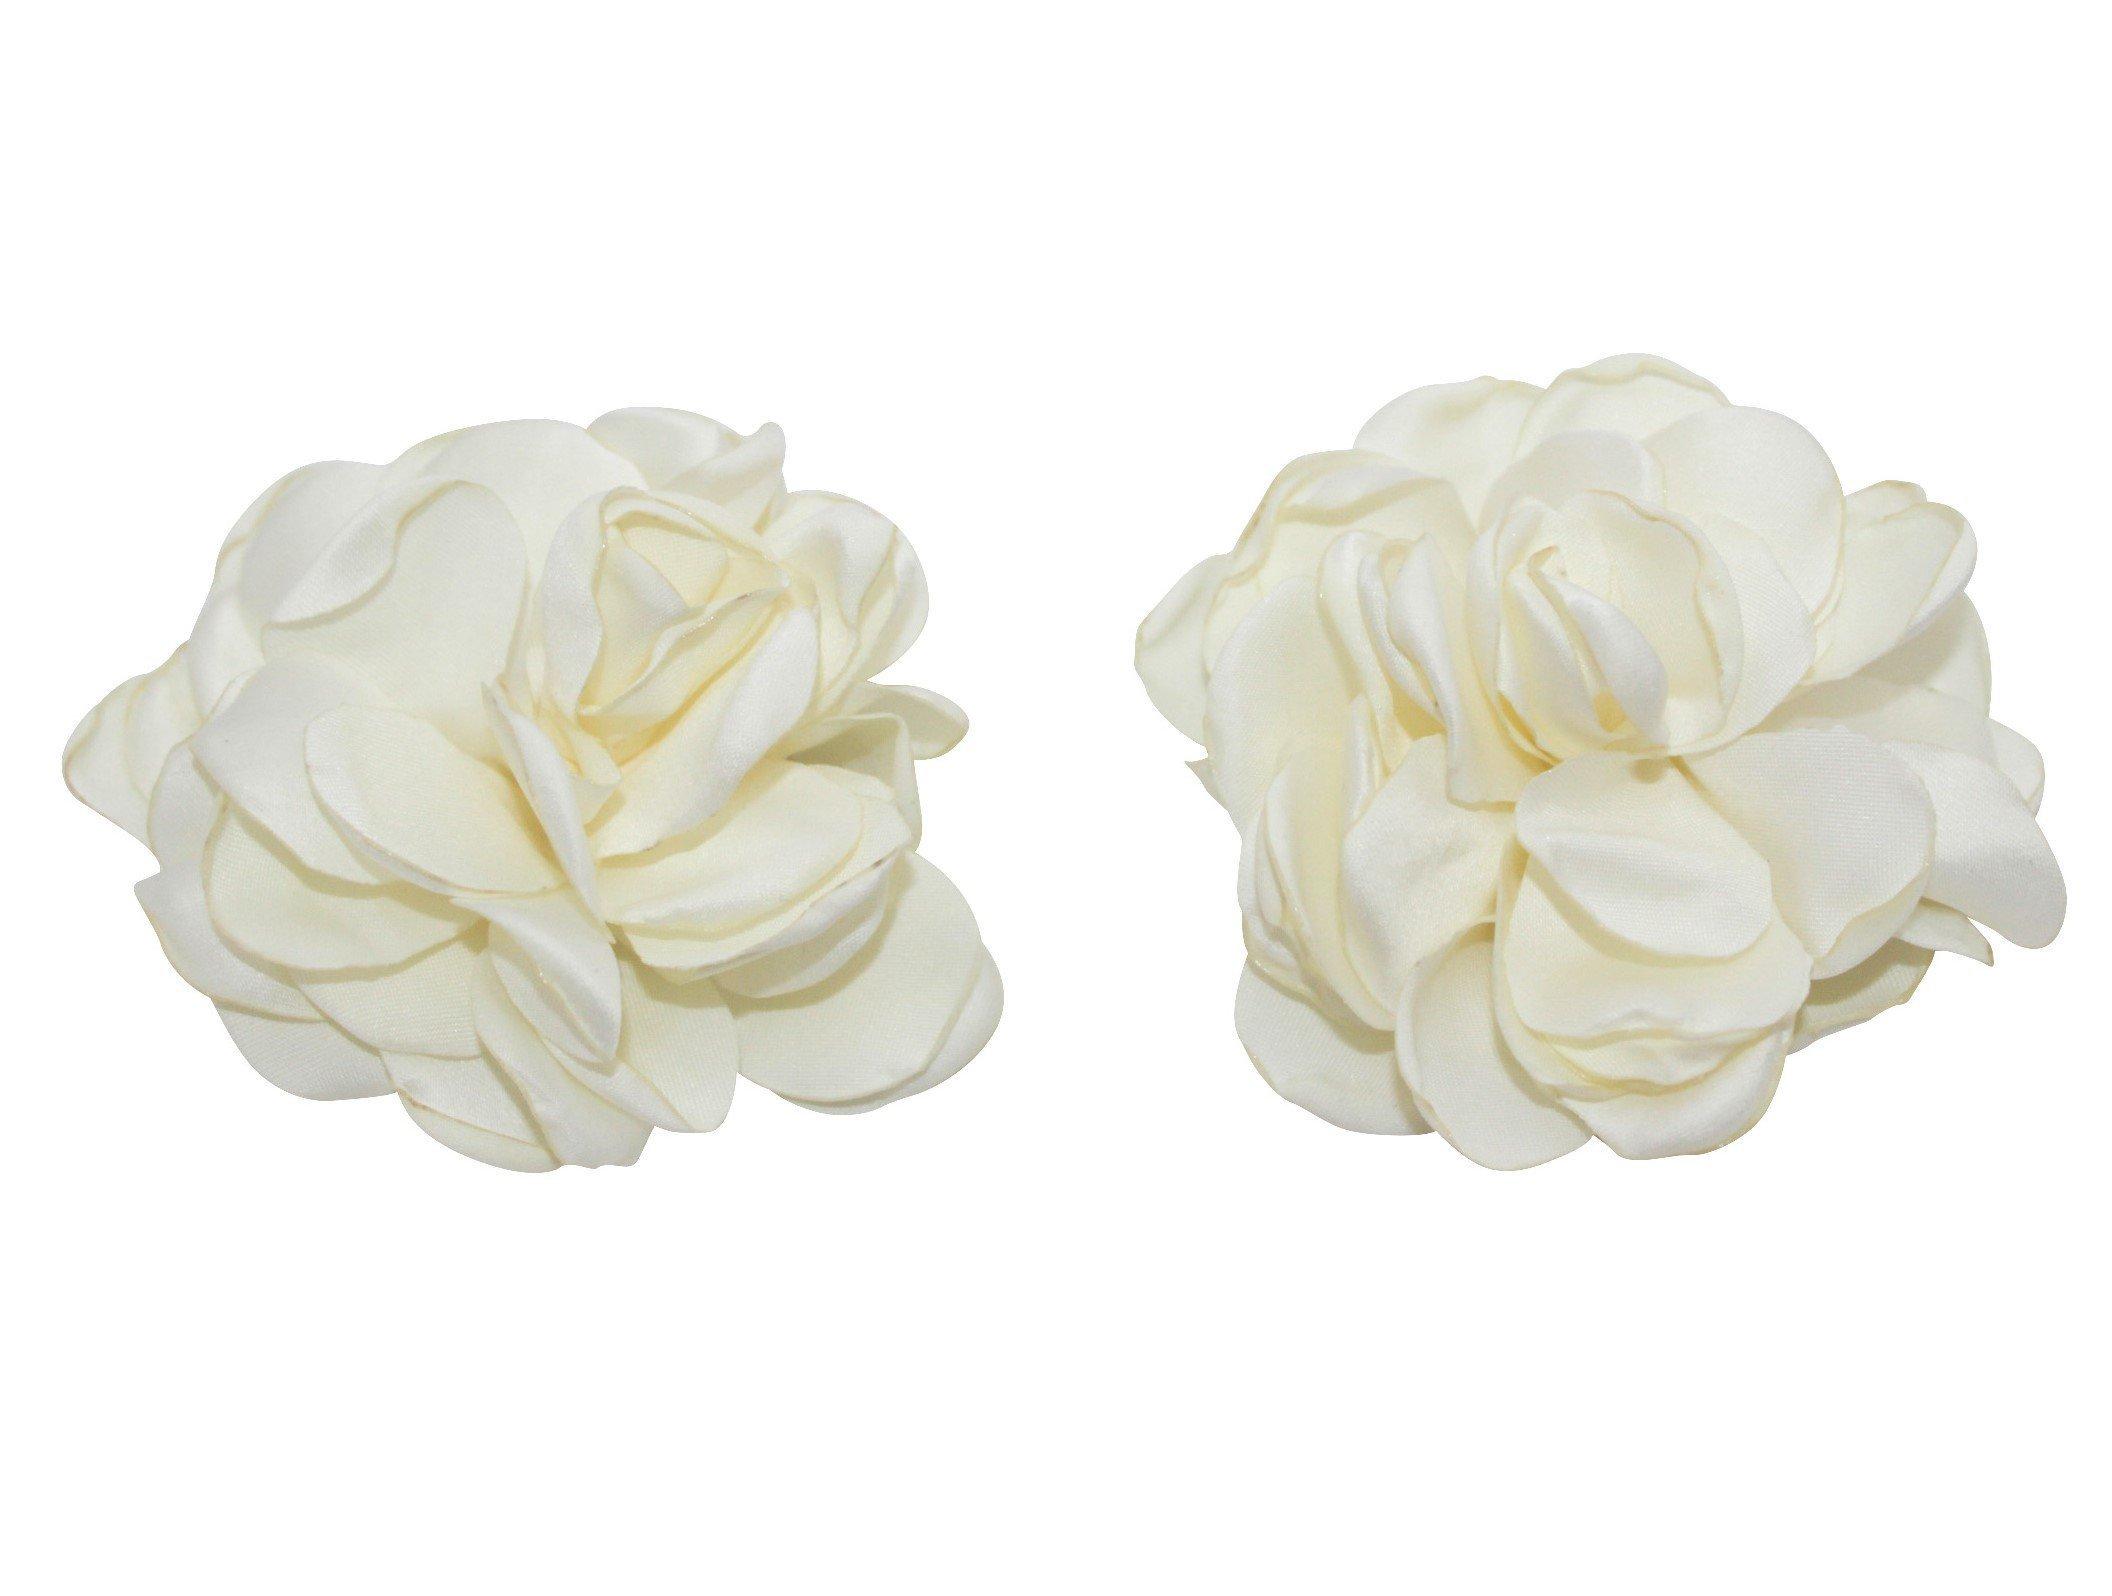 Ivory Rose Petals Flowers Alligator Hair Clips 2 pack